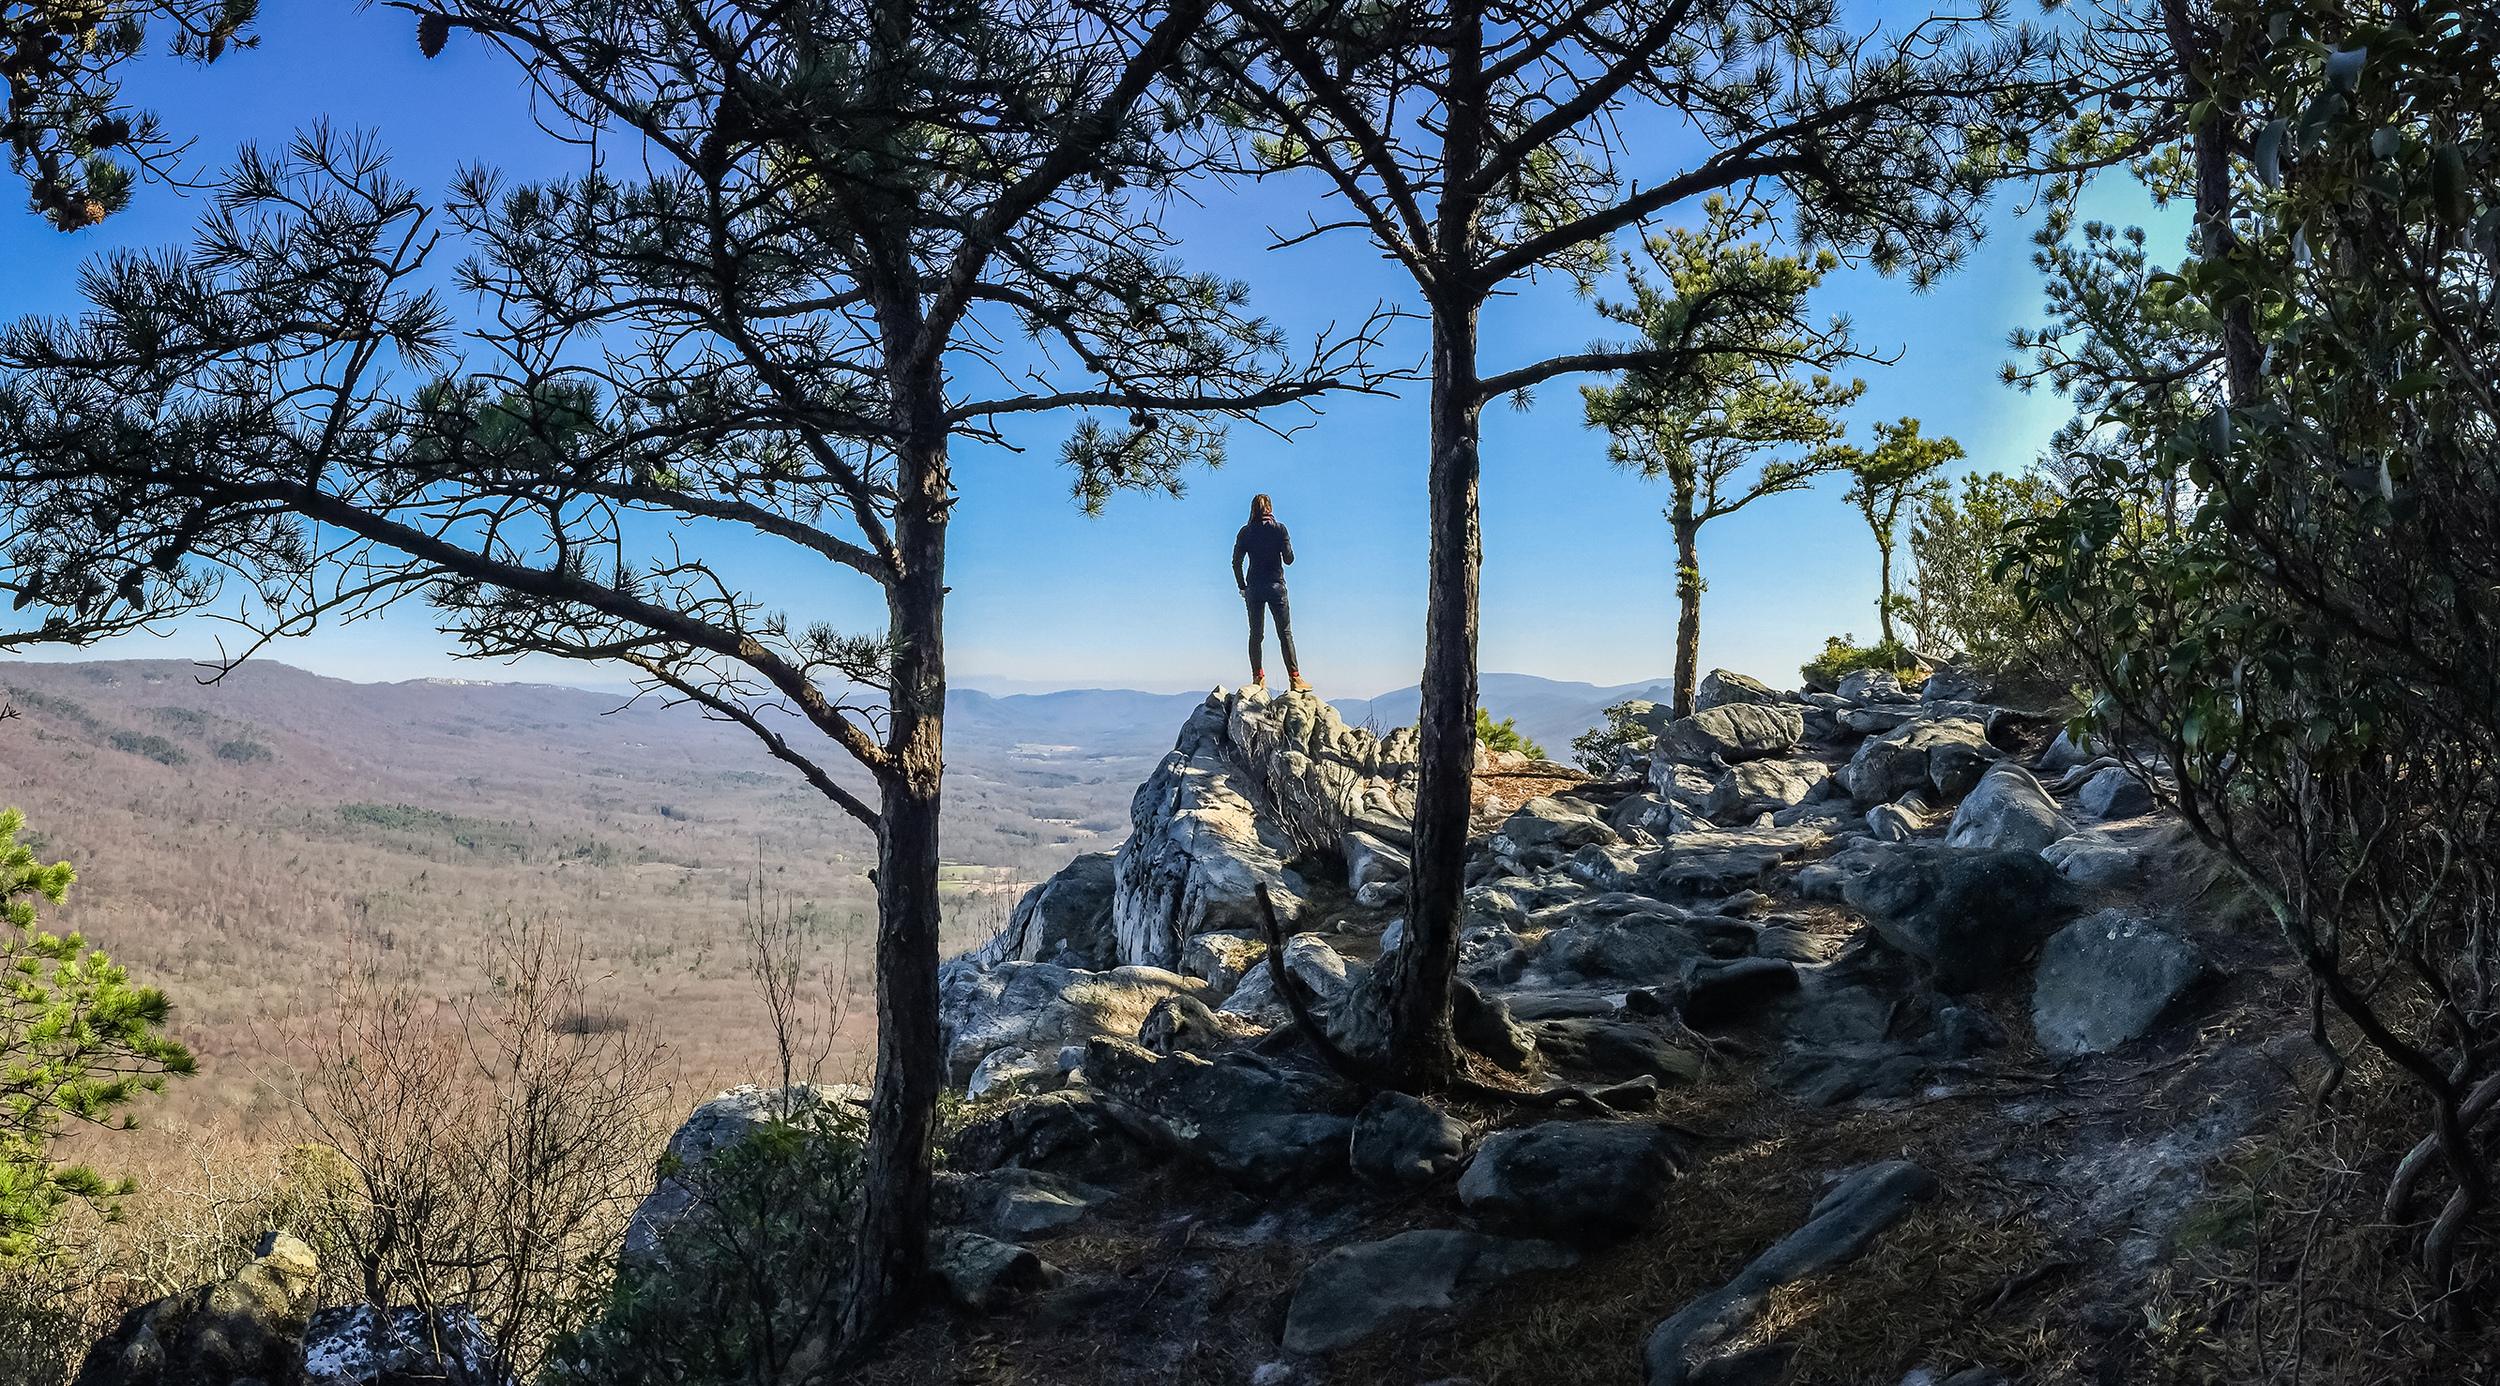 Tibbet Knob Summit, George Washington National Forest, West Virginia